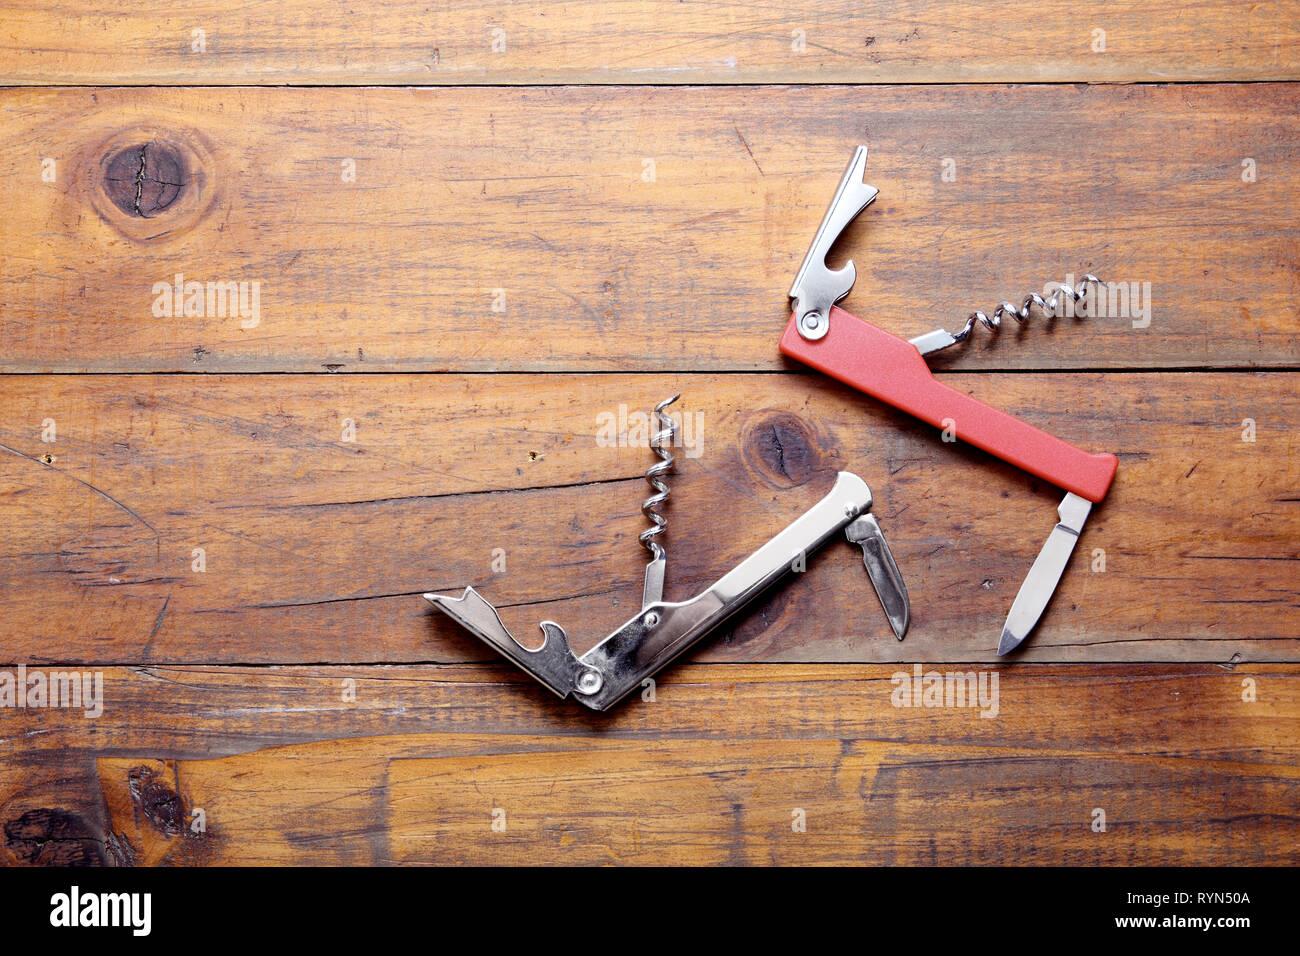 Multi Purpose Knife on Wooden Background - Stock Image